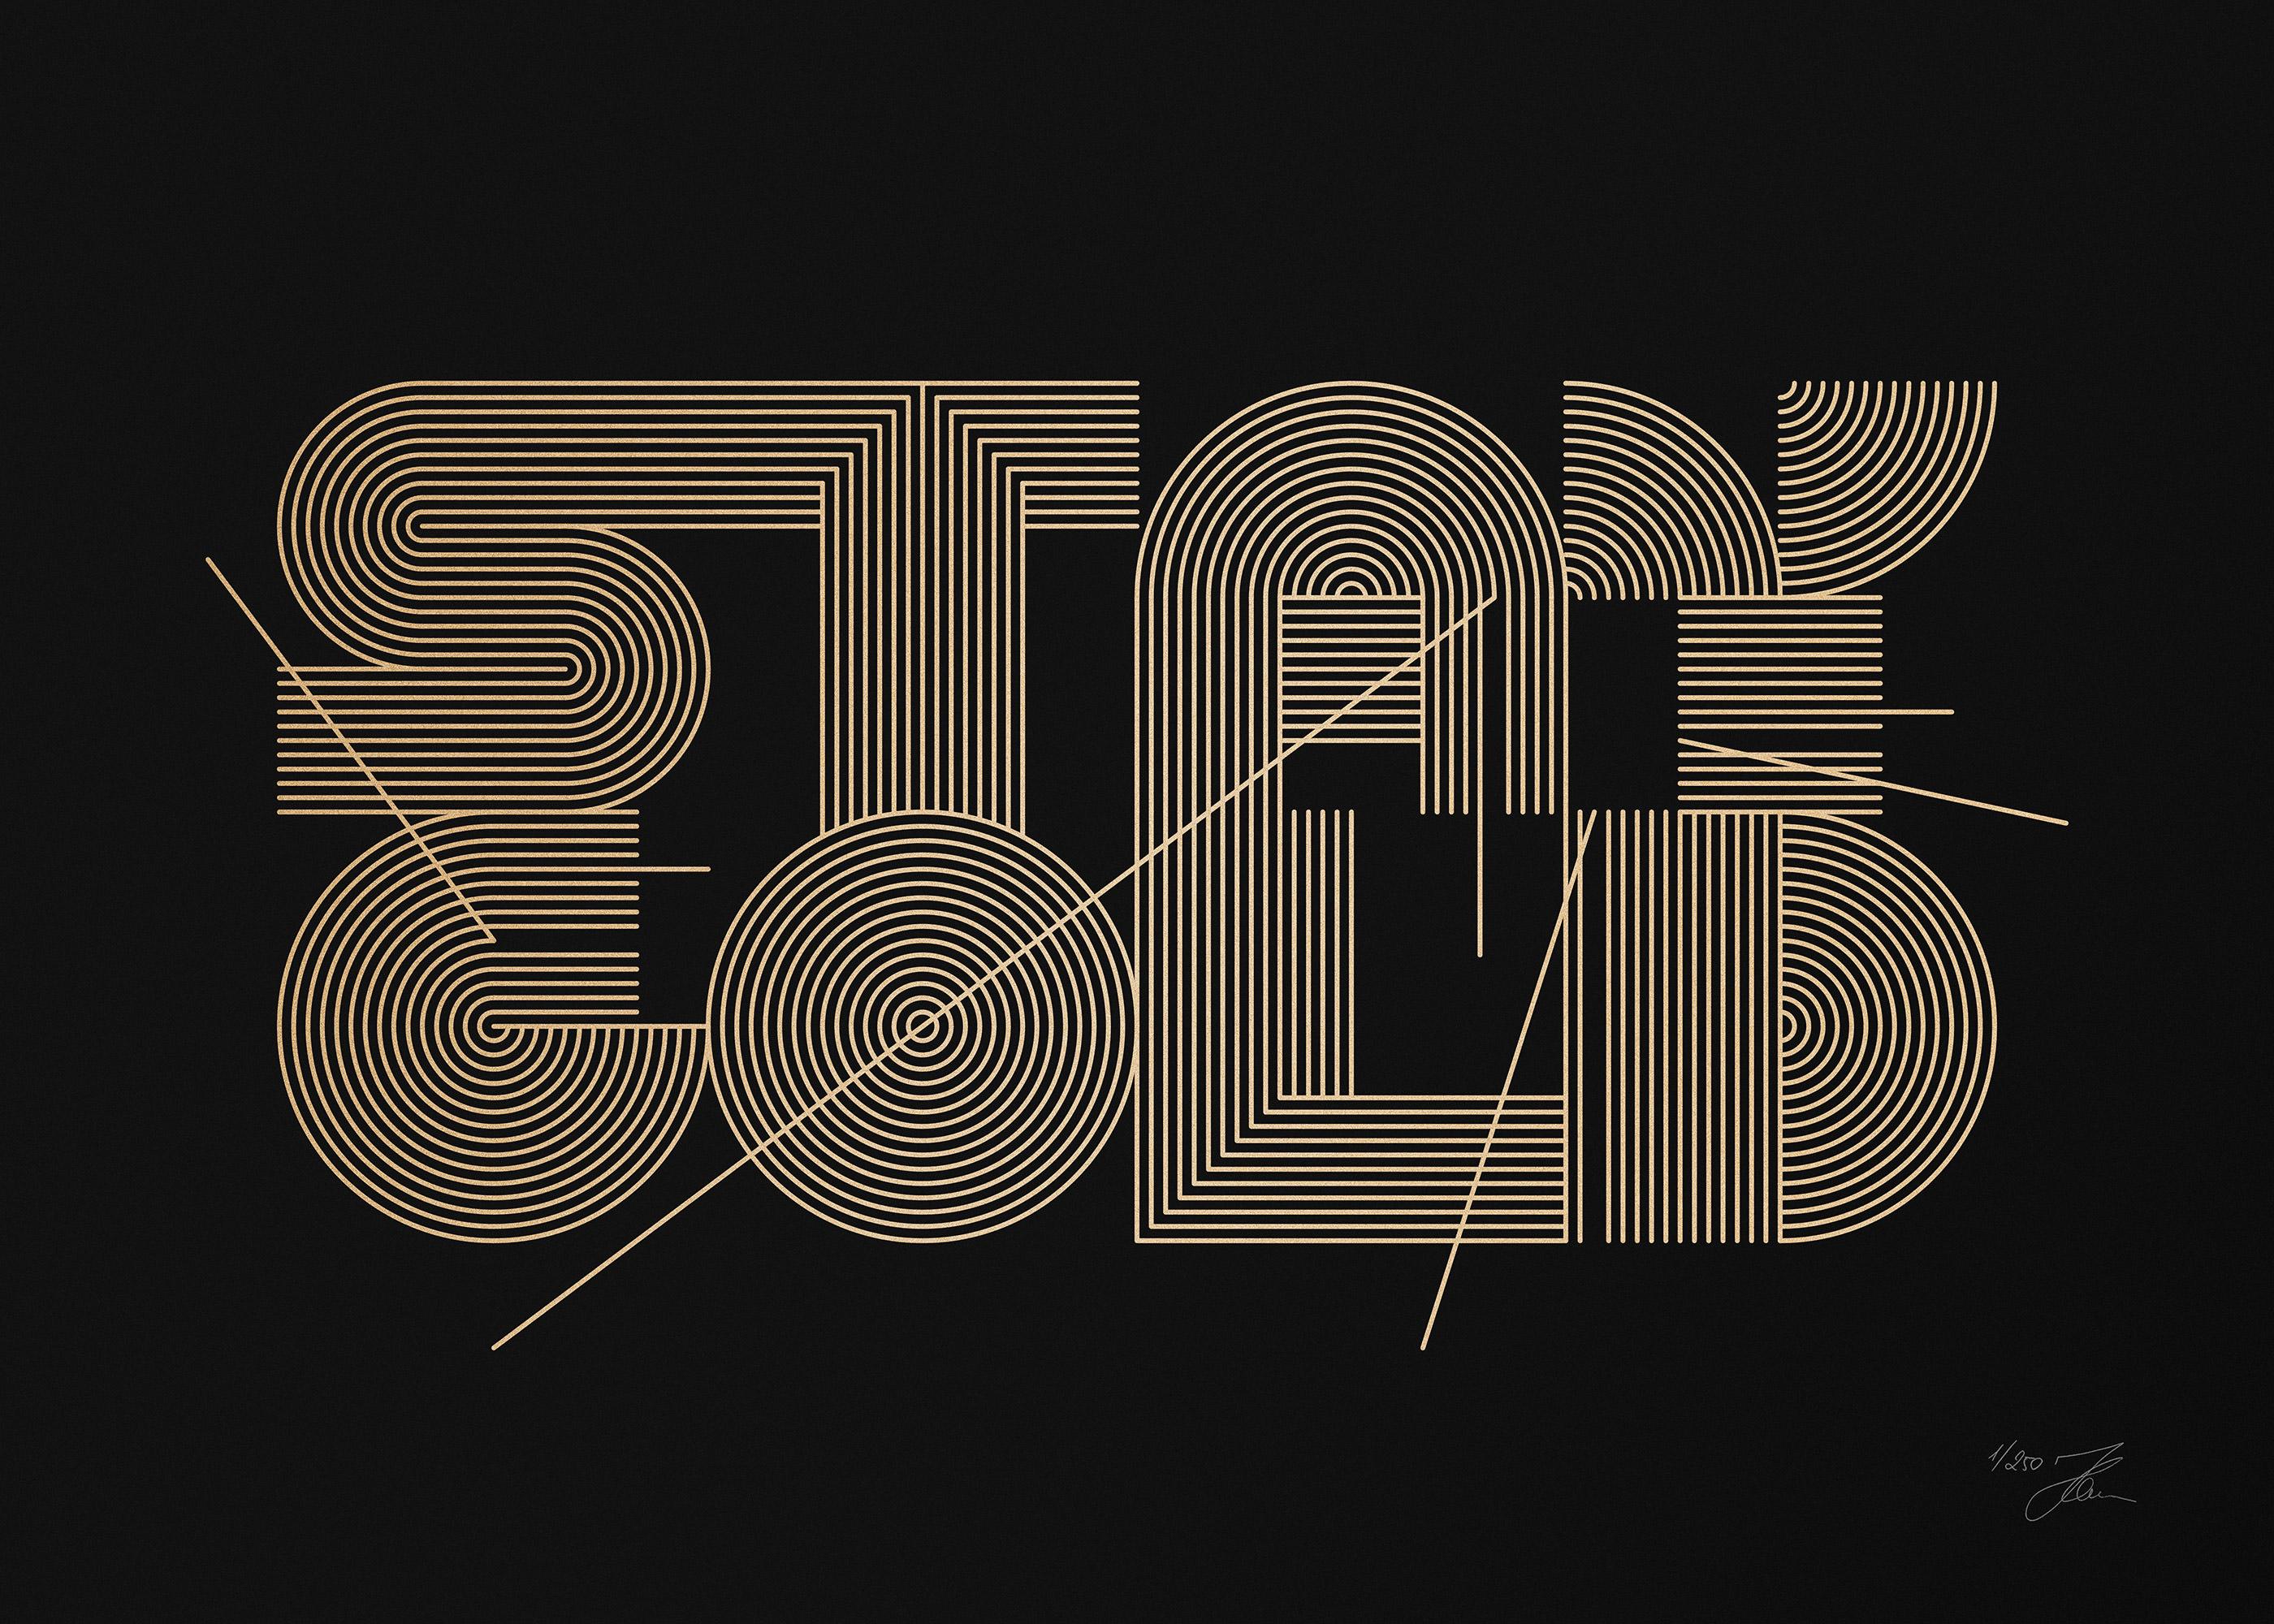 STAY GOLD (Gold/Black), Silkscreen Print